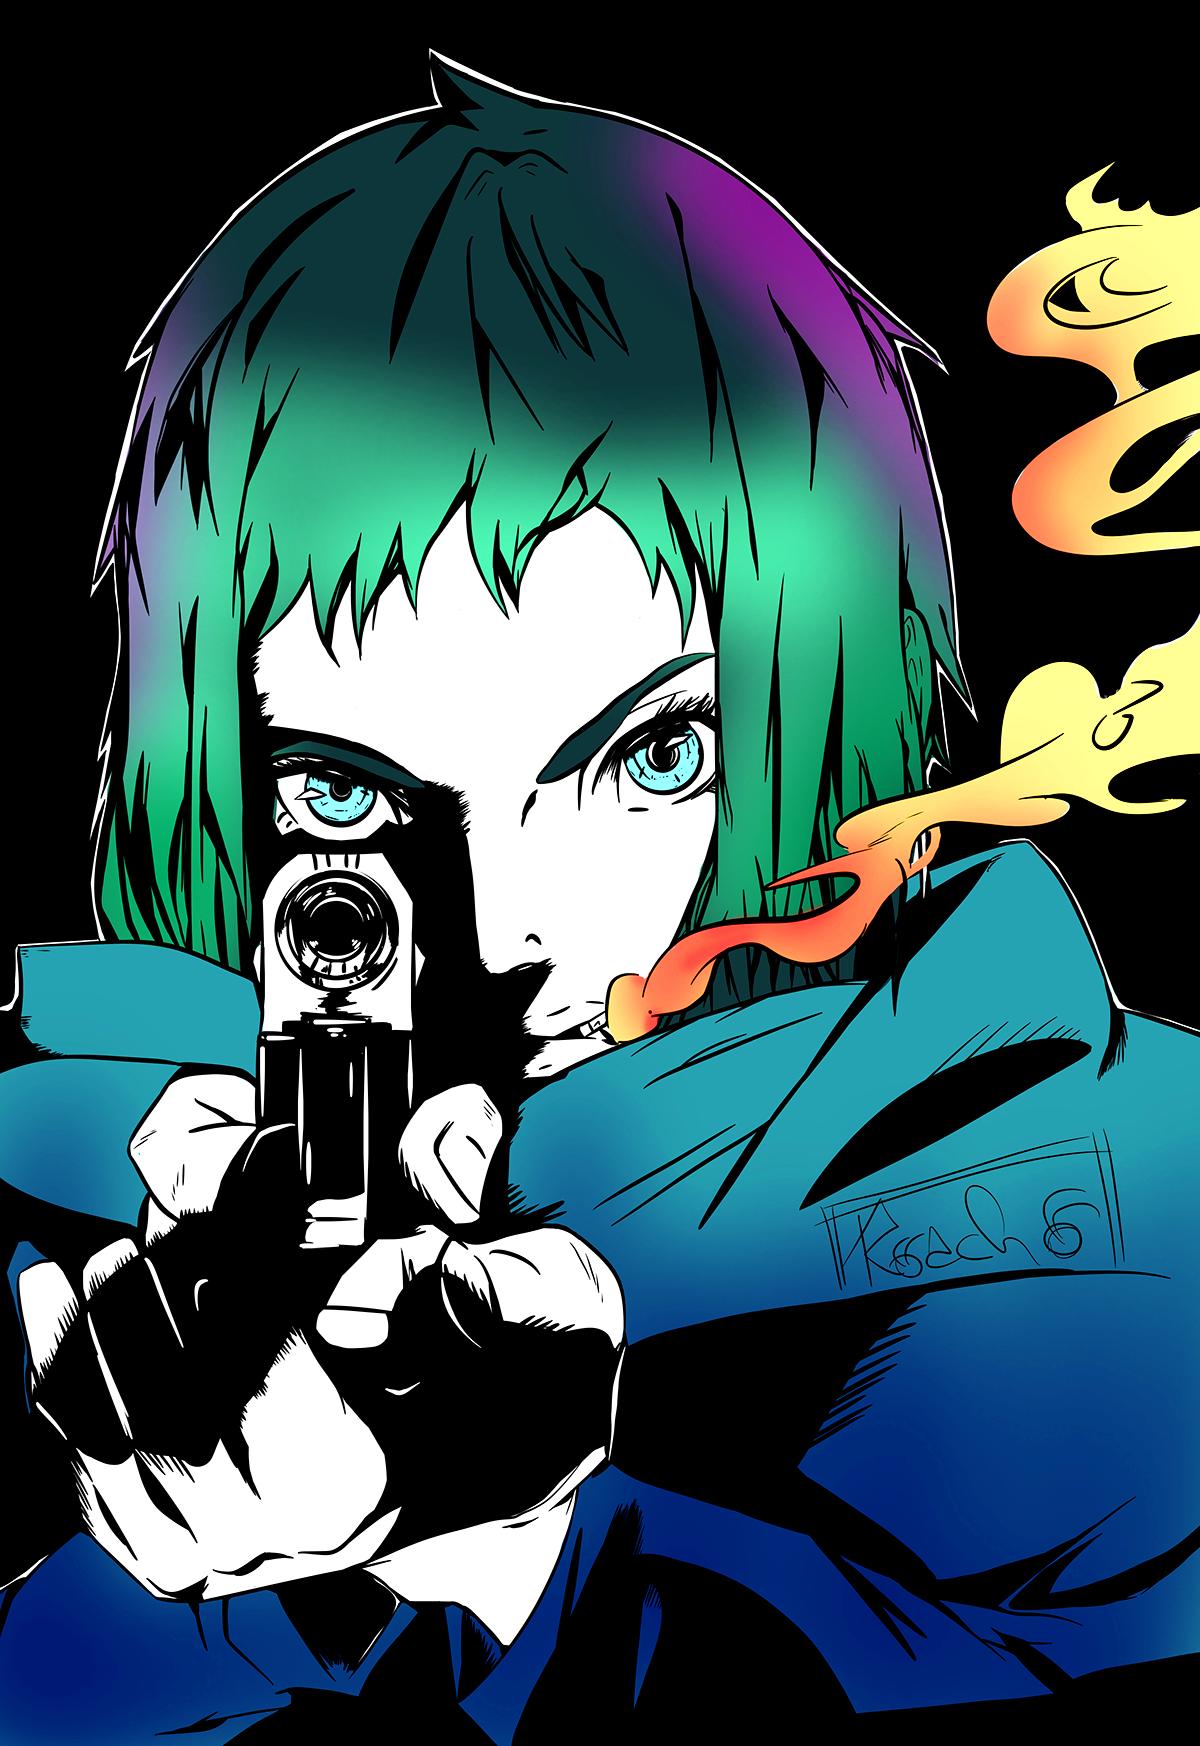 Major Gits Arise Ghost In The Shell Character Art Cyberpunk Art